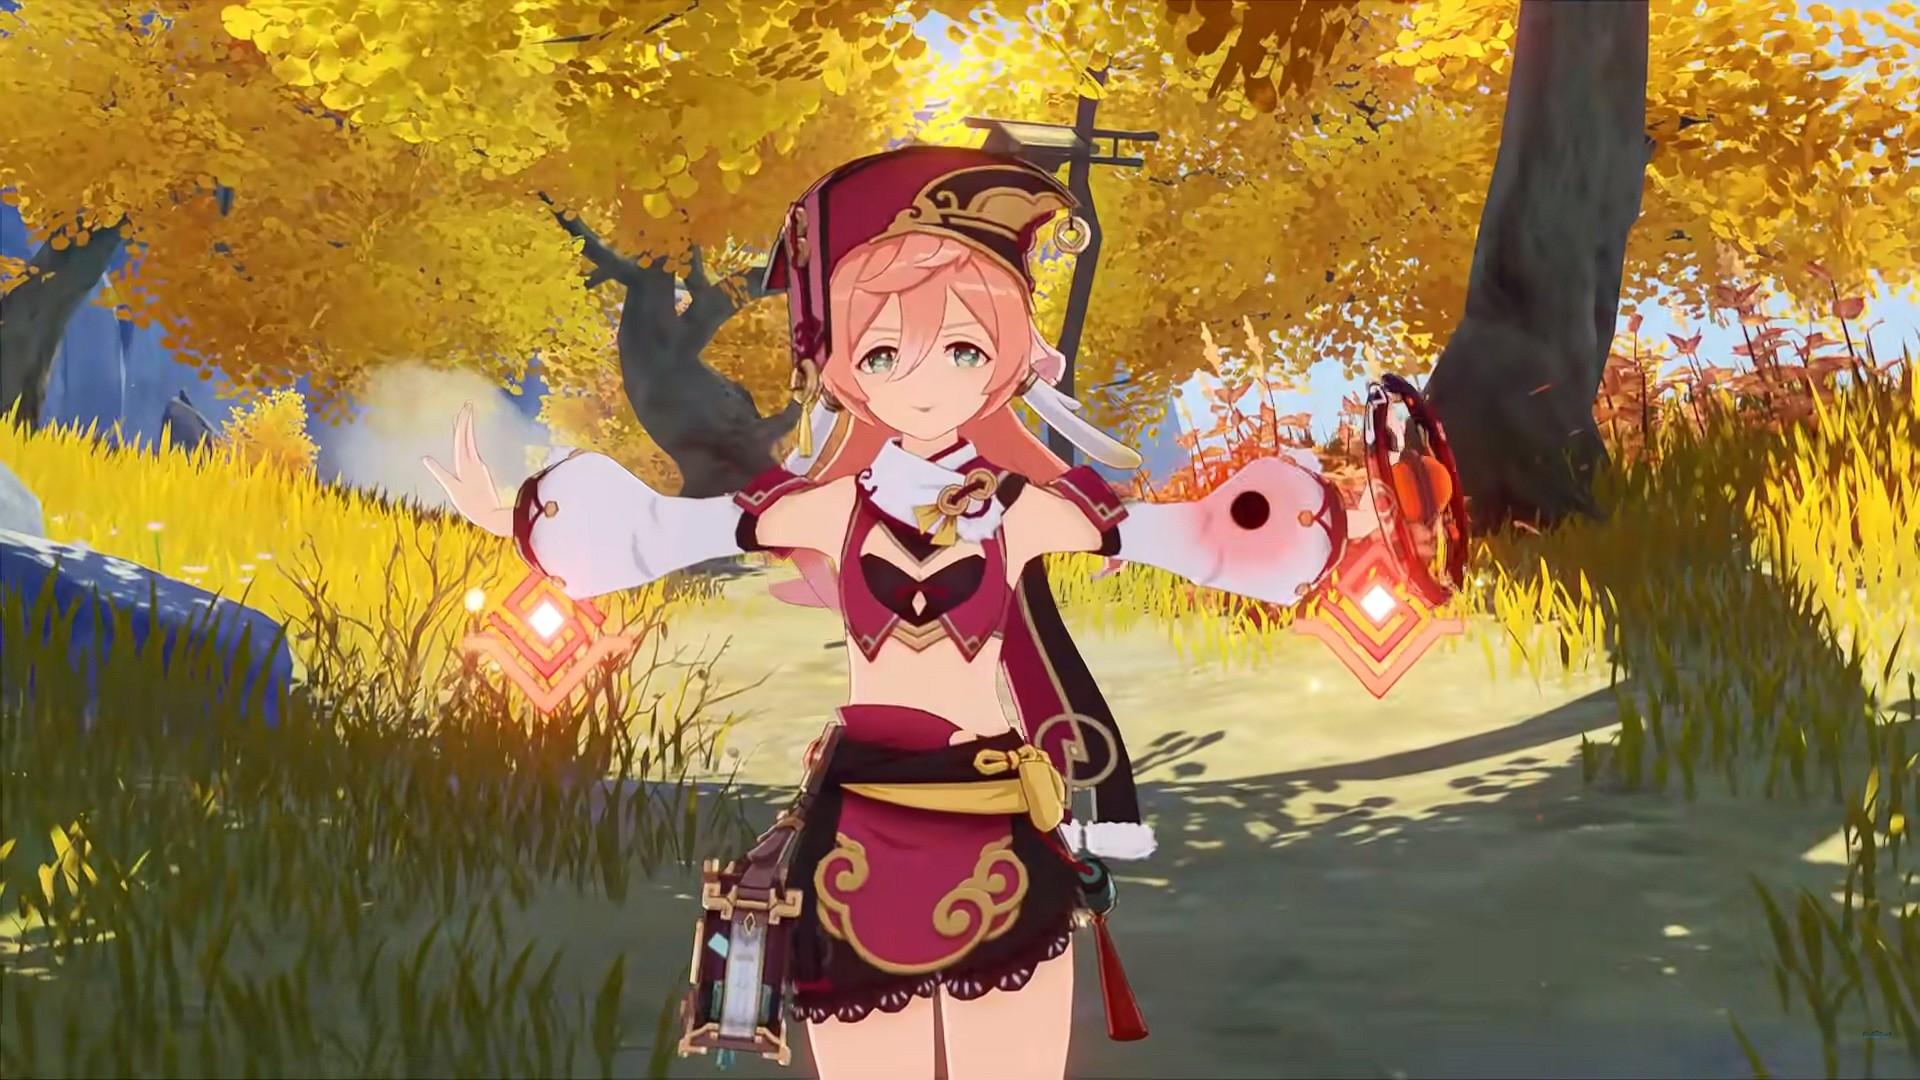 Genshin Impact character, Yanfei, stands in the woods casting Pyro magic